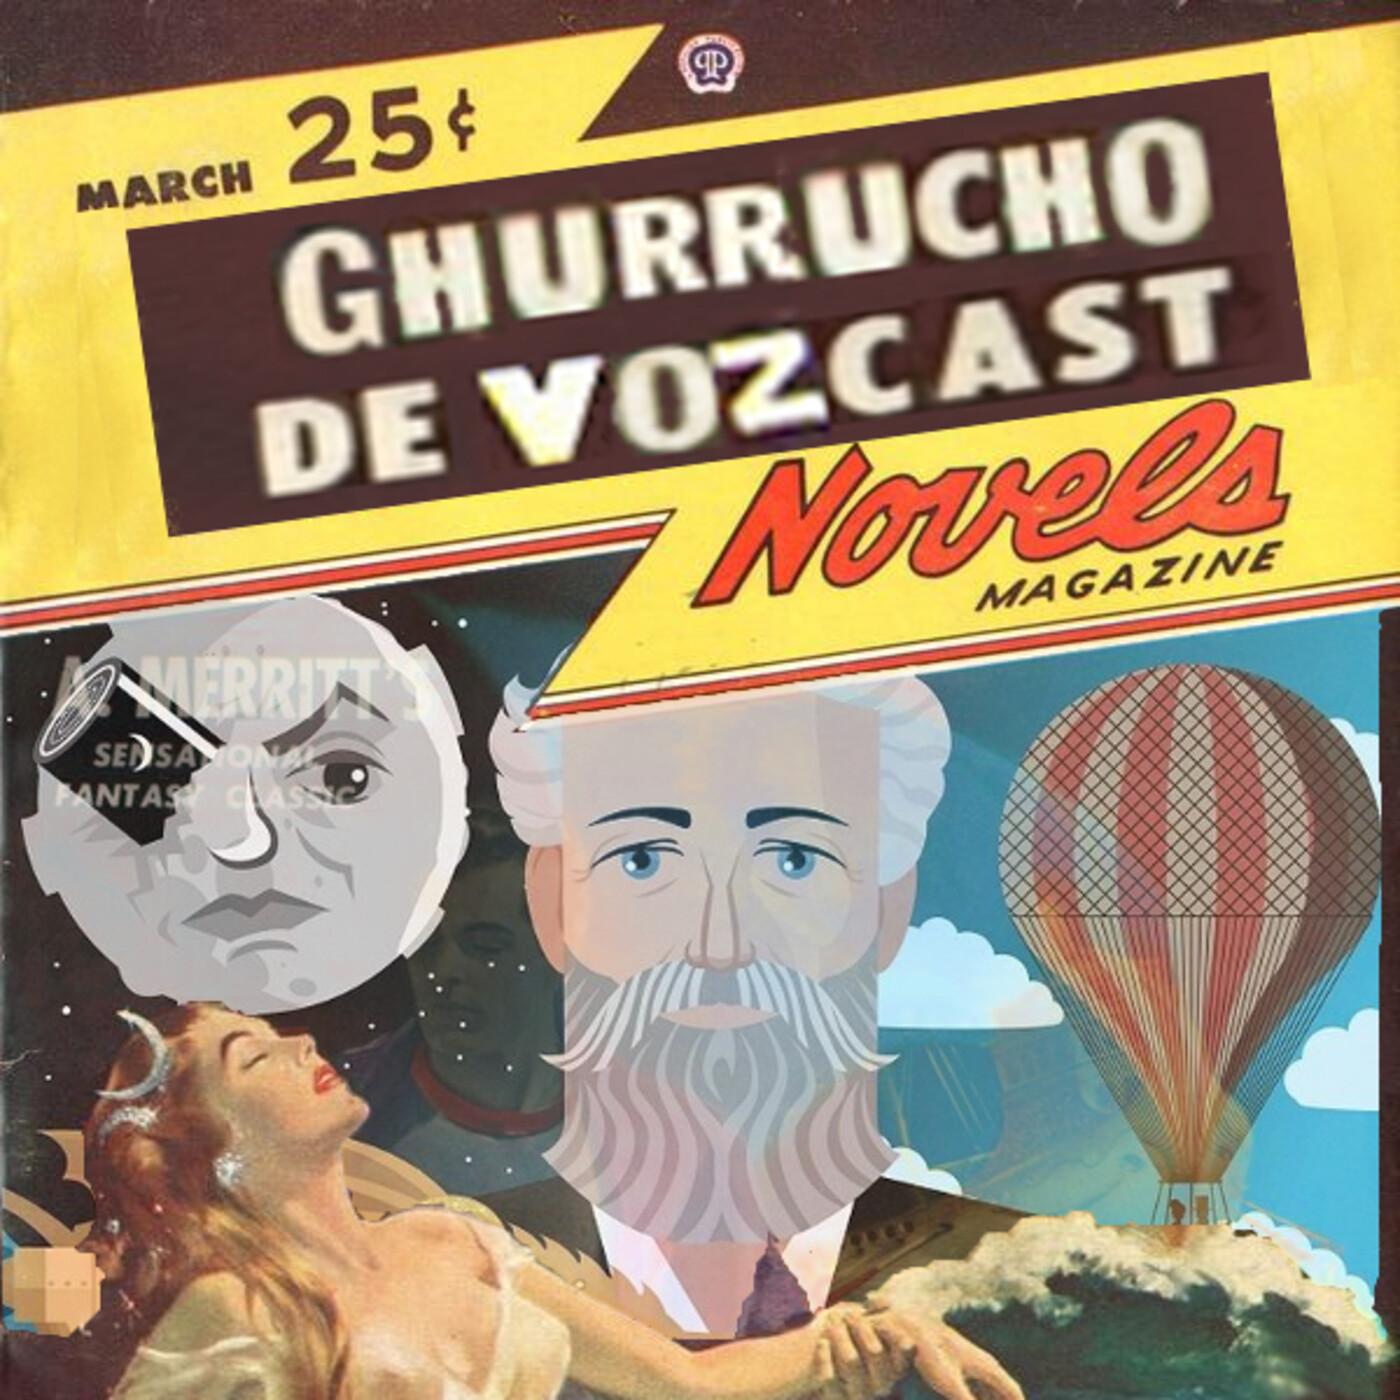 Gurrucho Verne e Steampunk. Podcast en galego